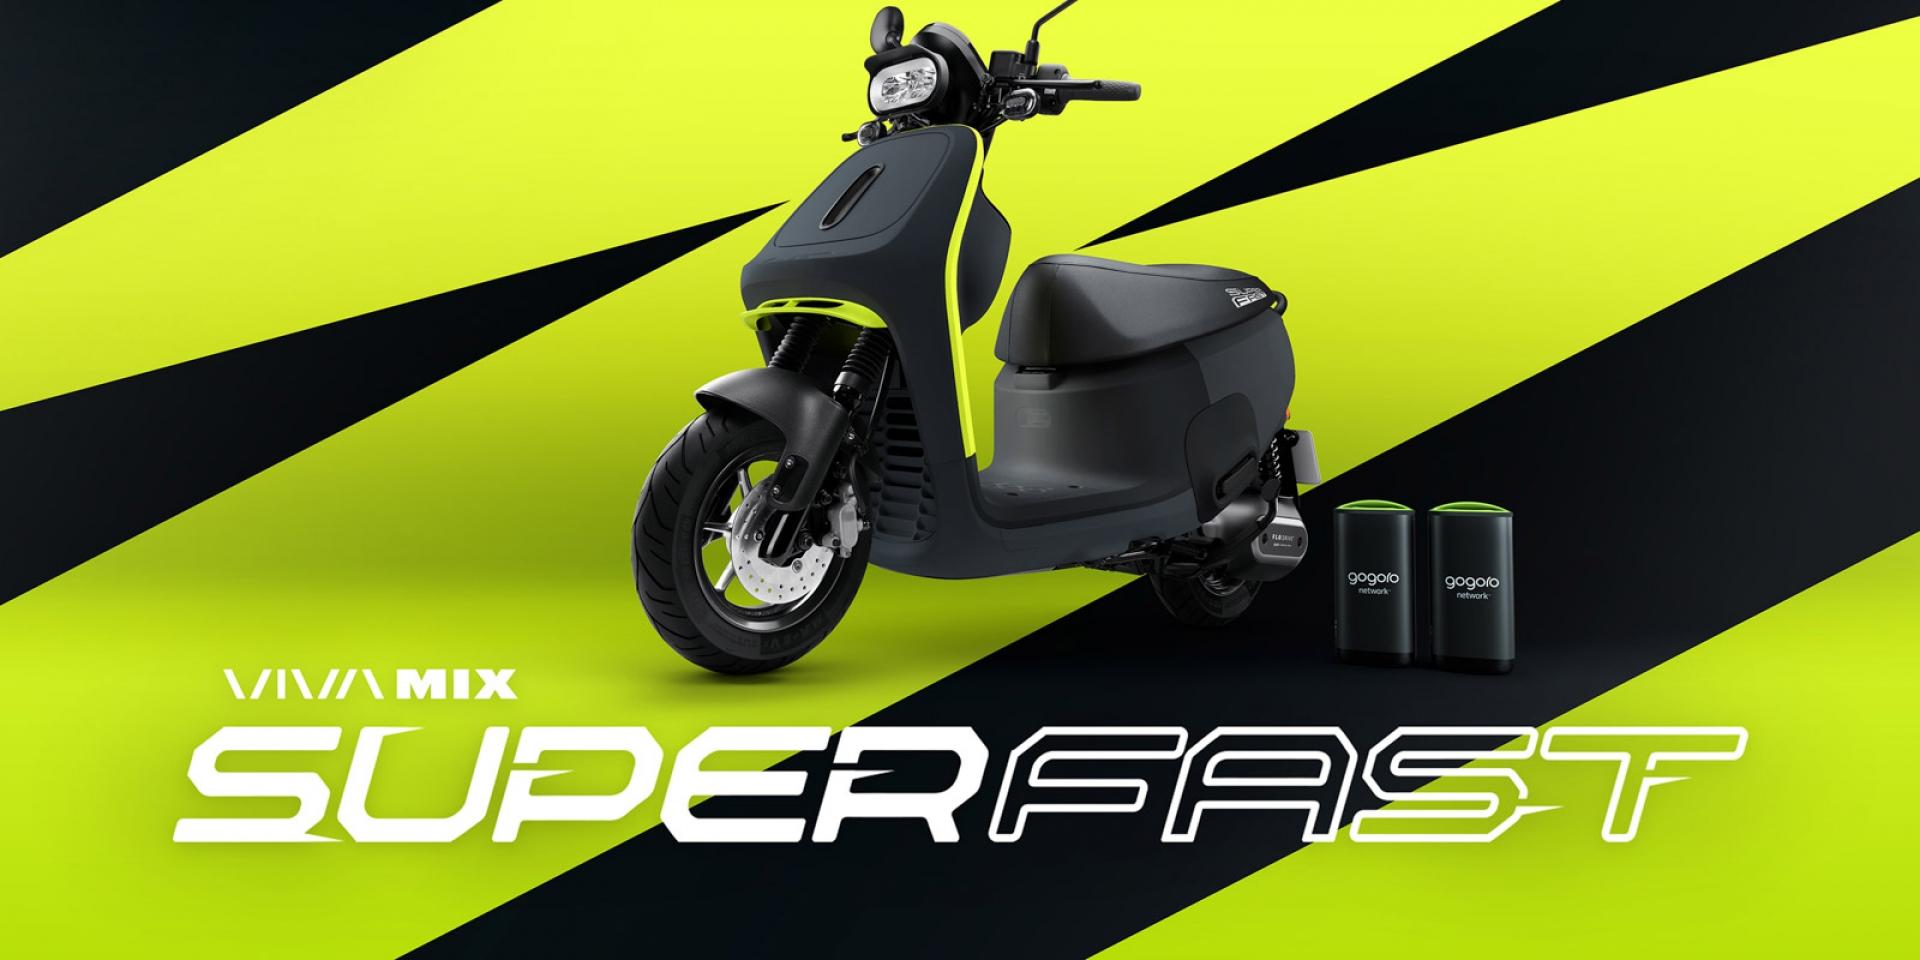 Gogoro VIVA MIX SUPERFAST 極速登場  開學季最受注目的性能車款